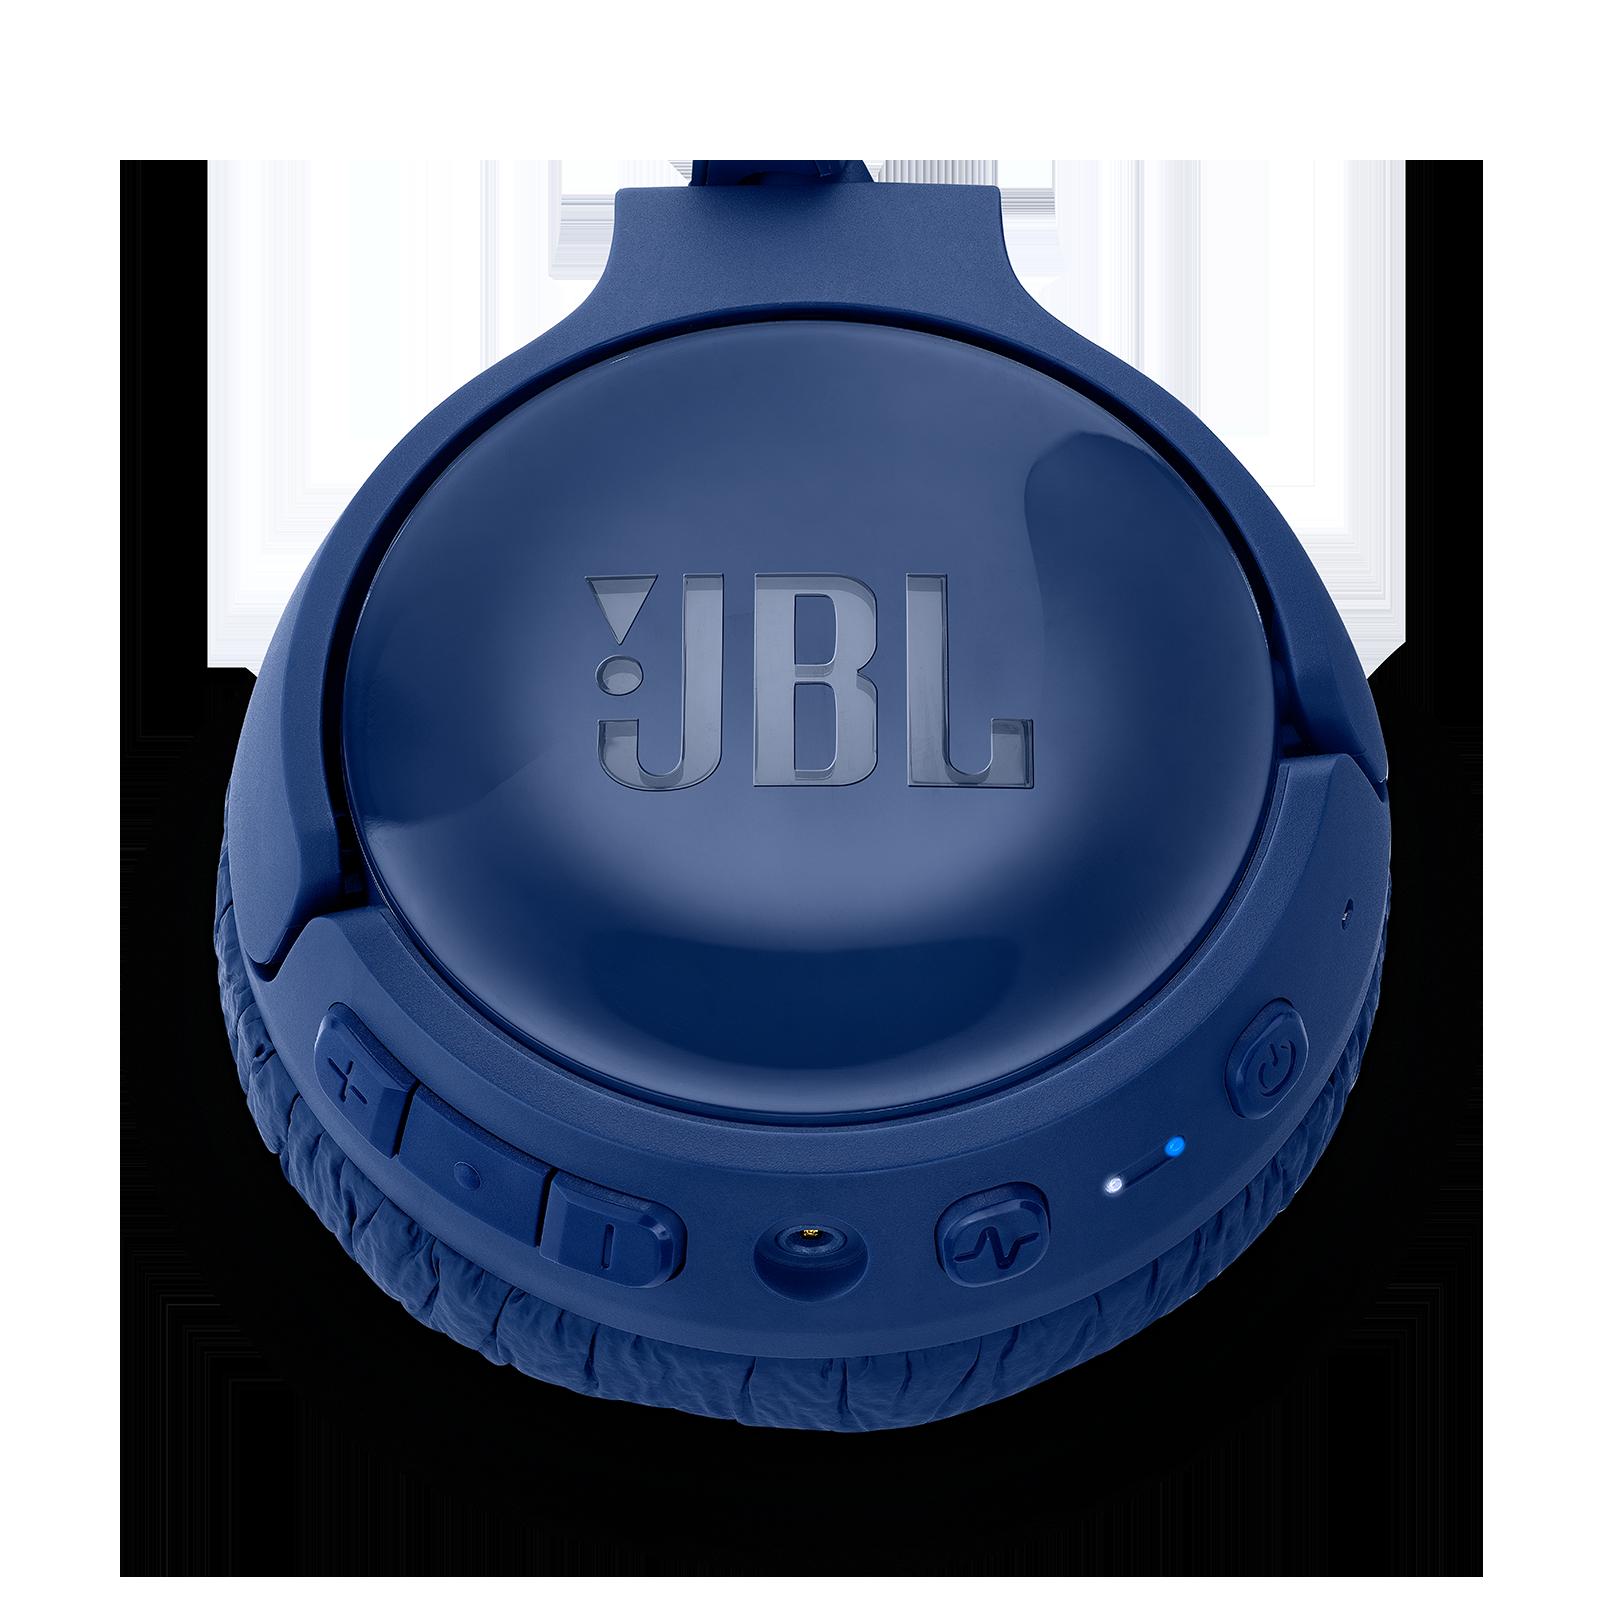 JBL TUNE 600BTNC - Blue - Wireless, on-ear, active noise-cancelling headphones. - Detailshot 3